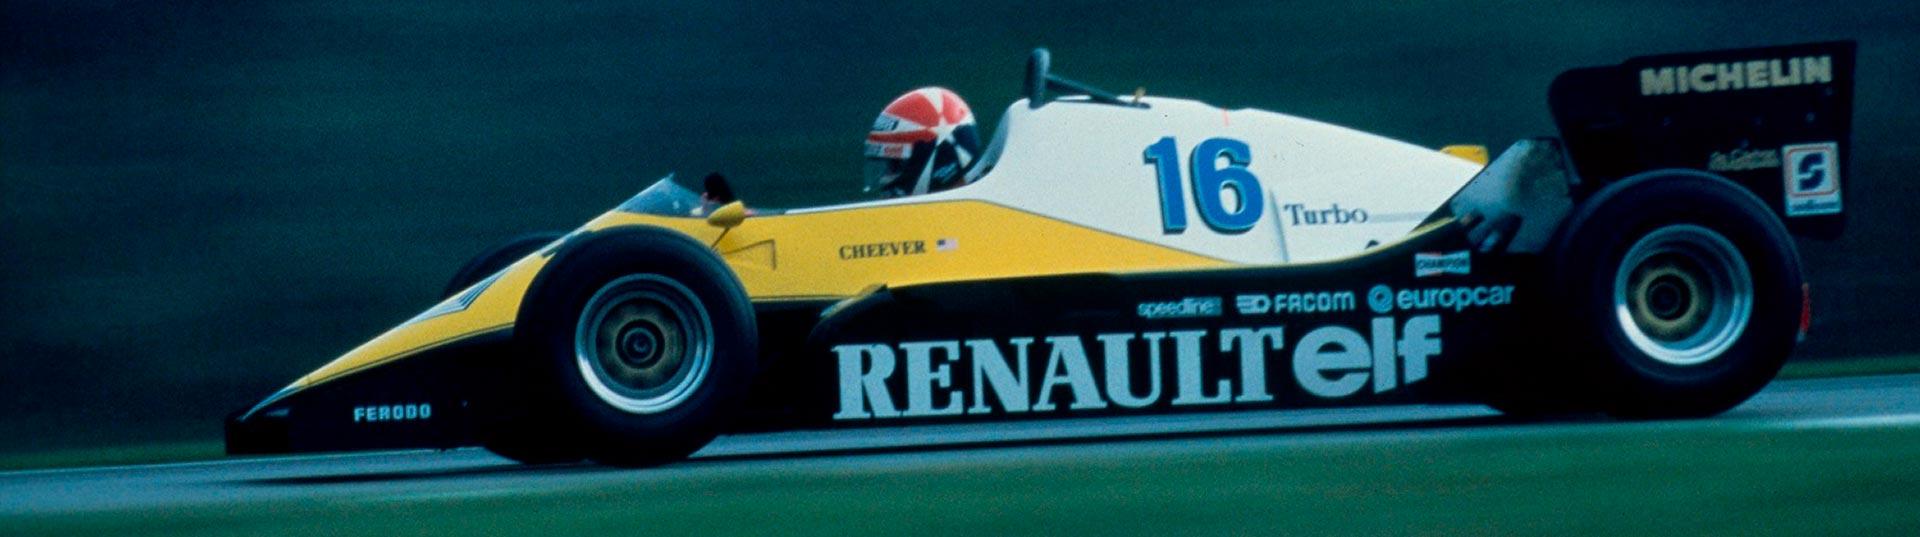 Renault traz F1 de volta ao Estoril